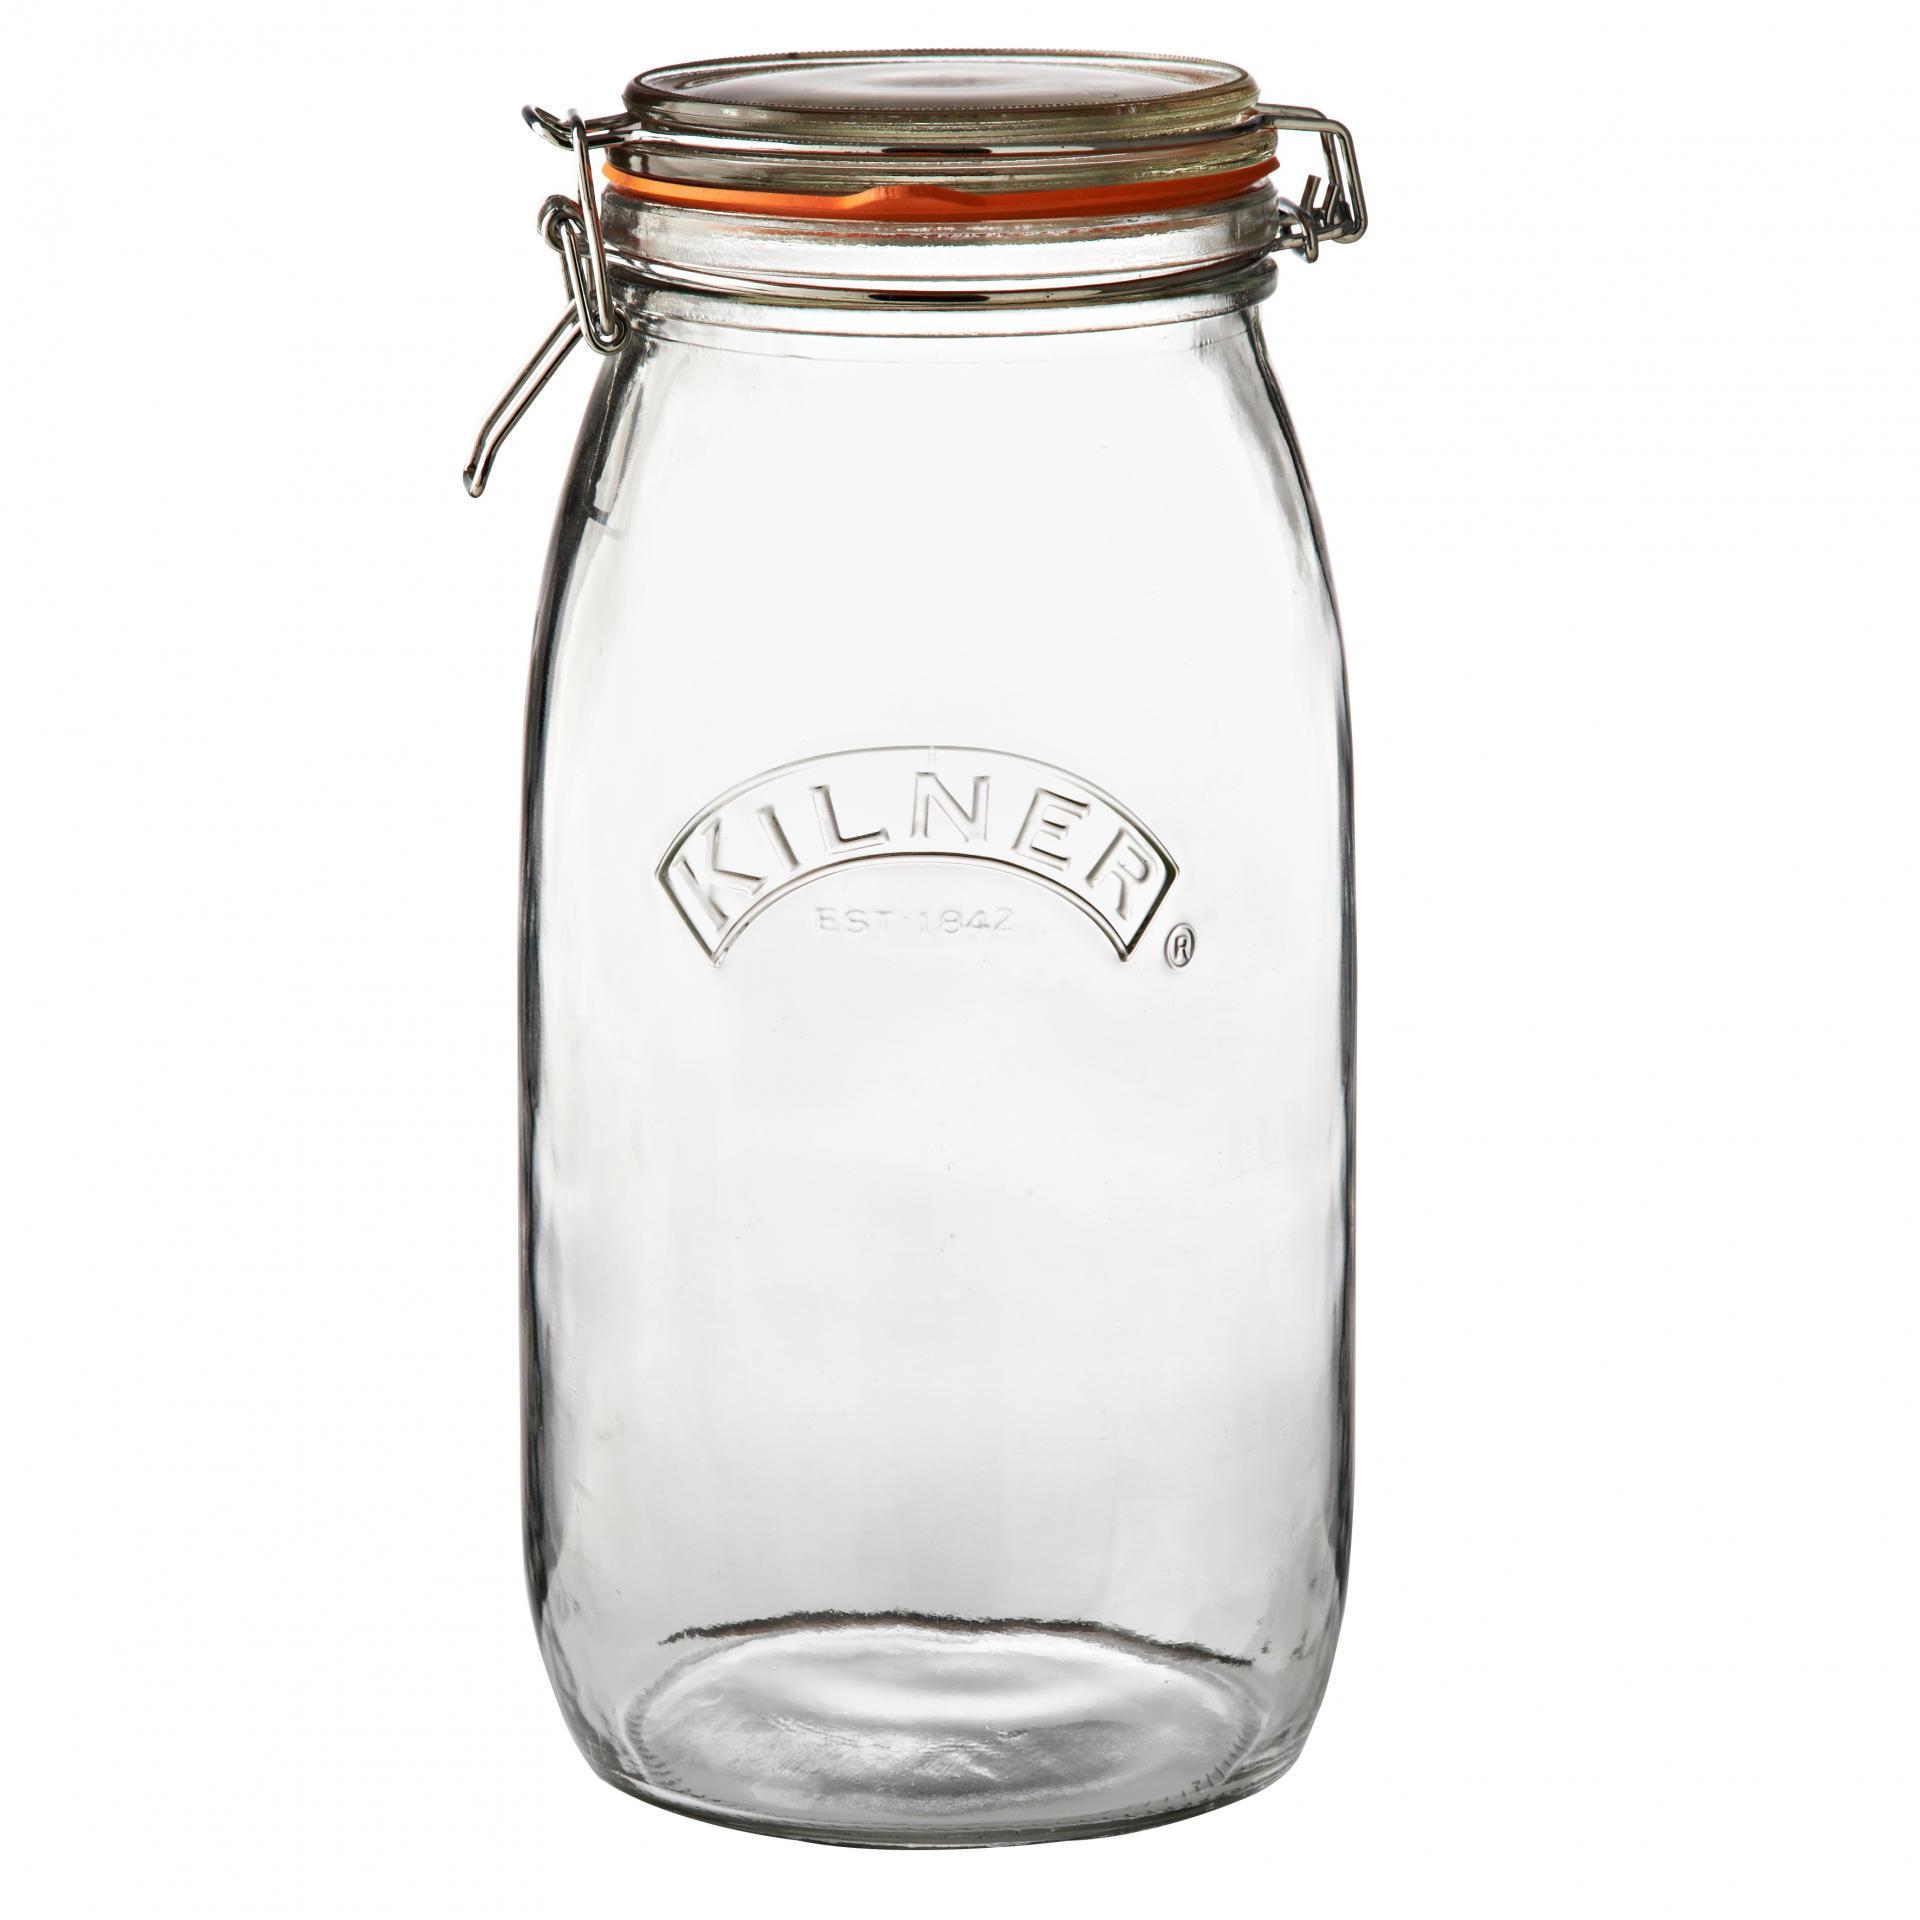 KILNER Kulatá zavařovací sklenice s klipem 3 l, čirá barva, sklo